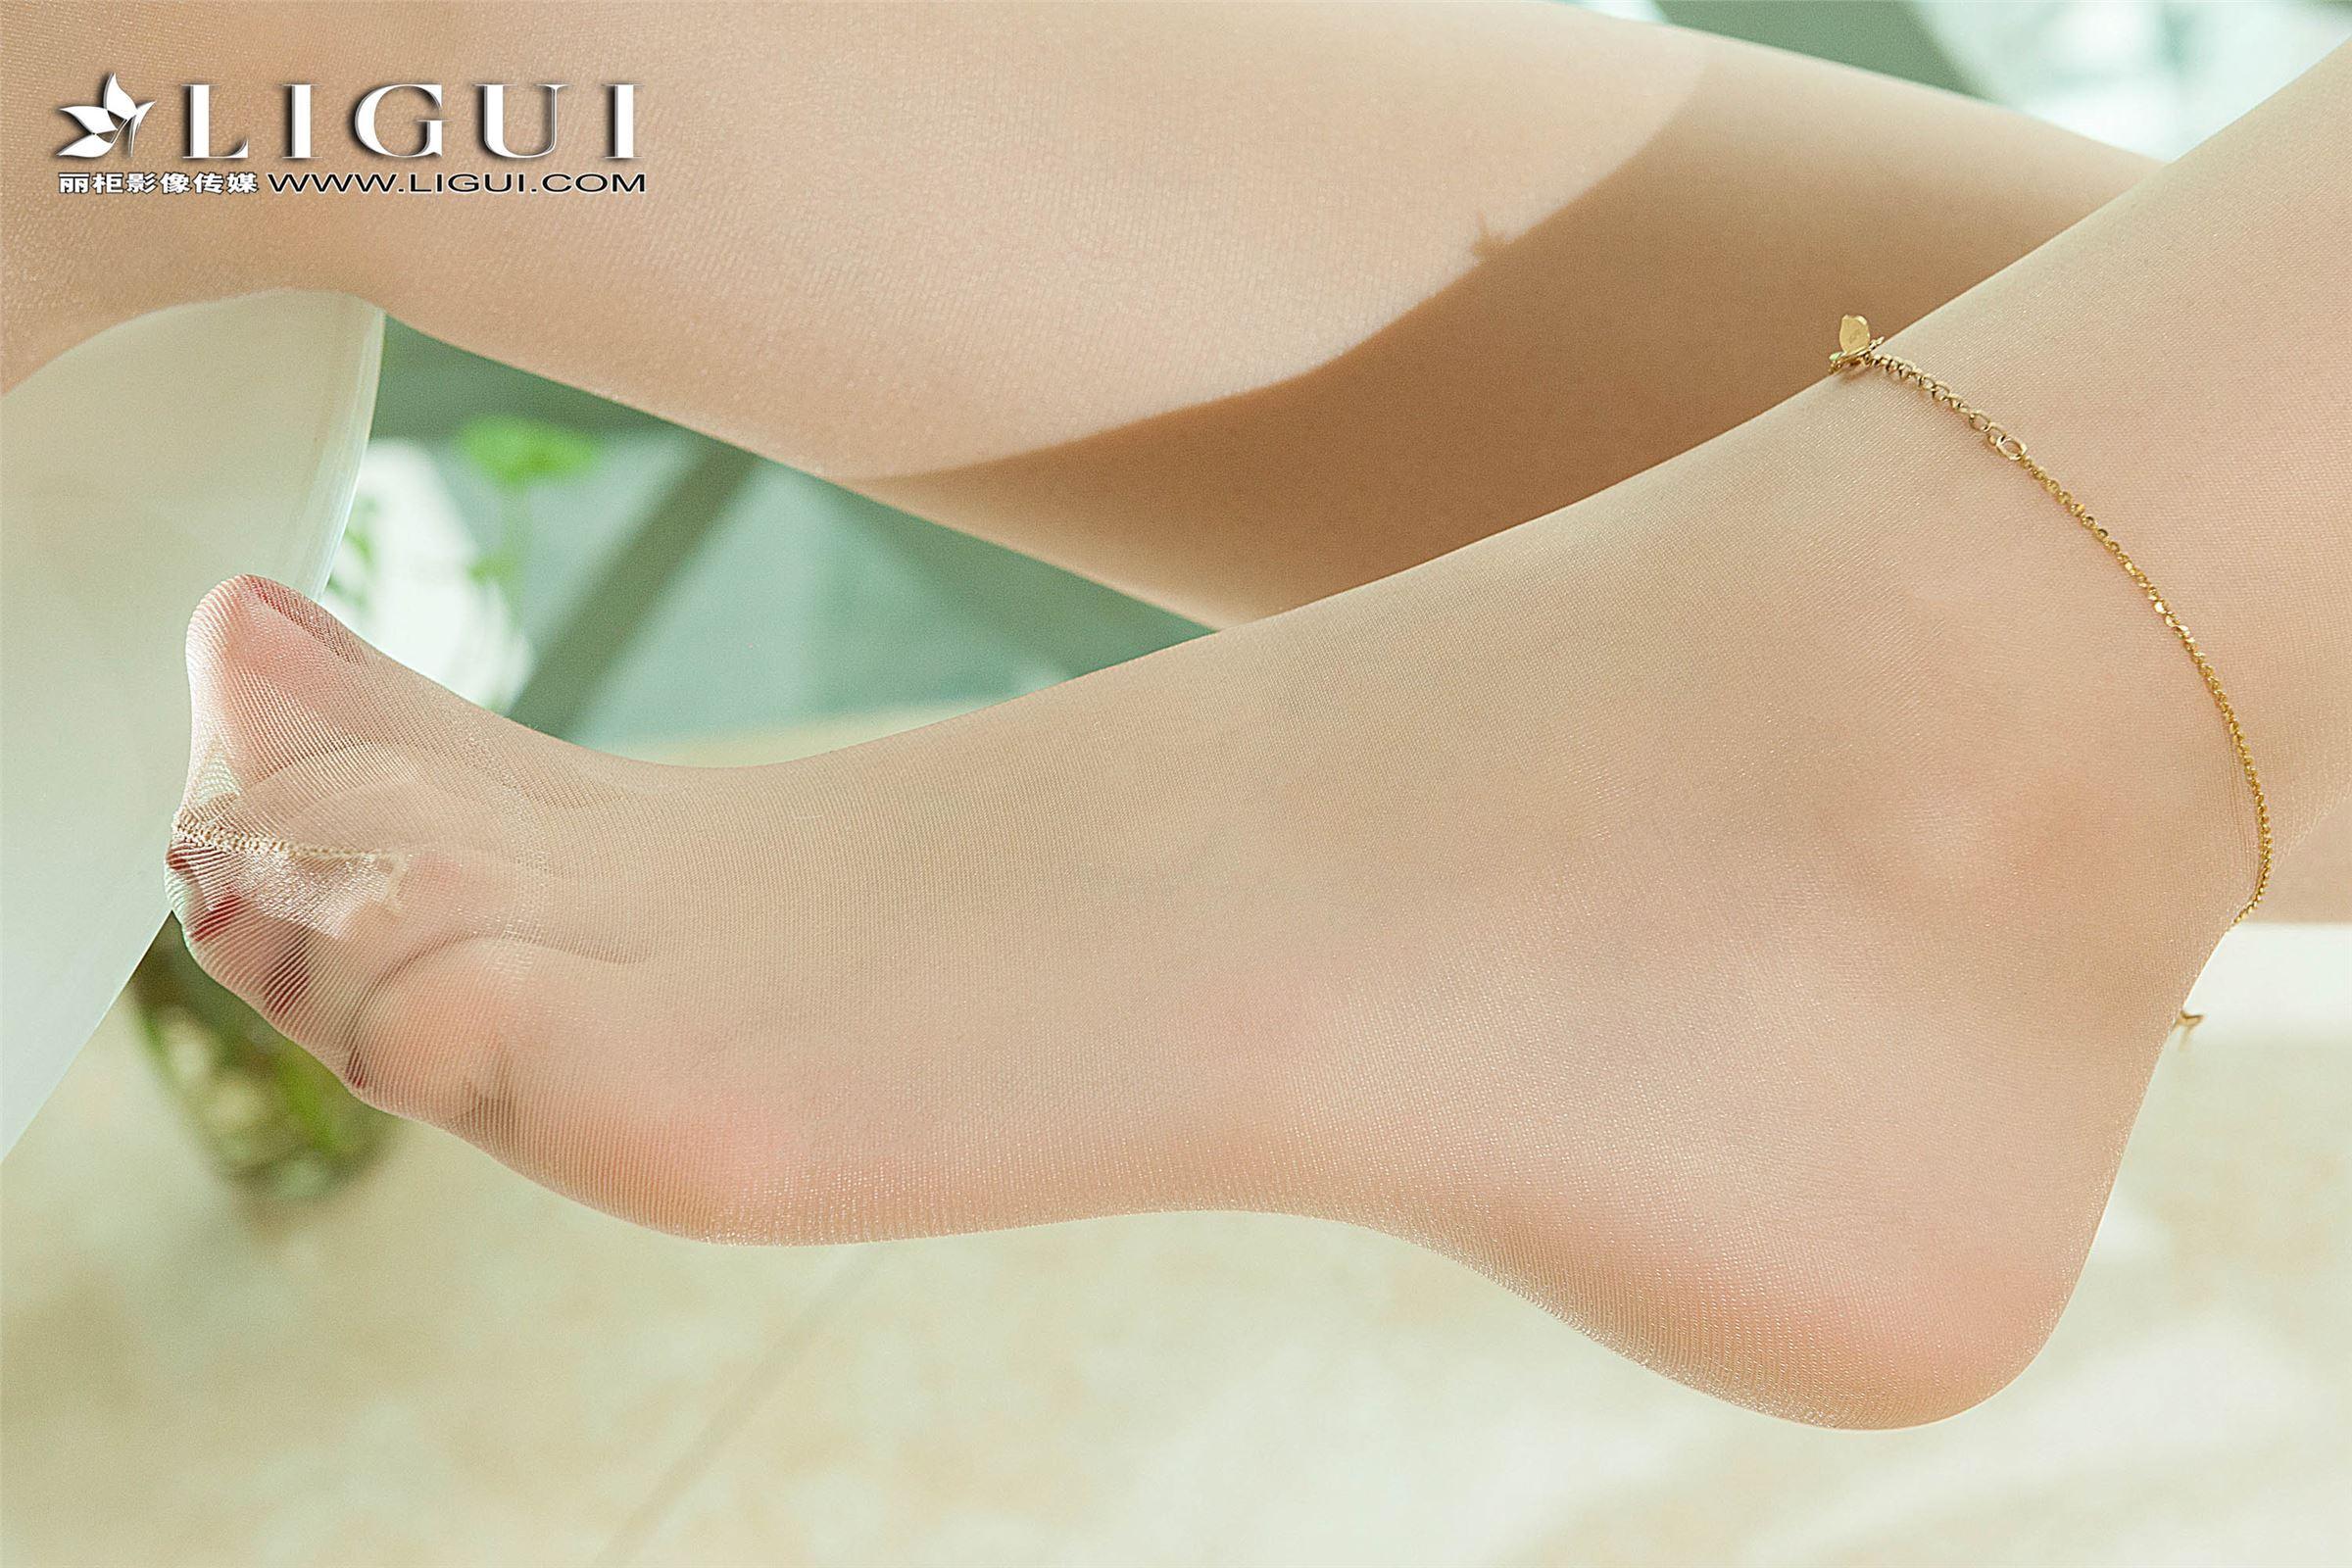 Ligui丽柜 2018.10.08 网络丽人 Model 小戈